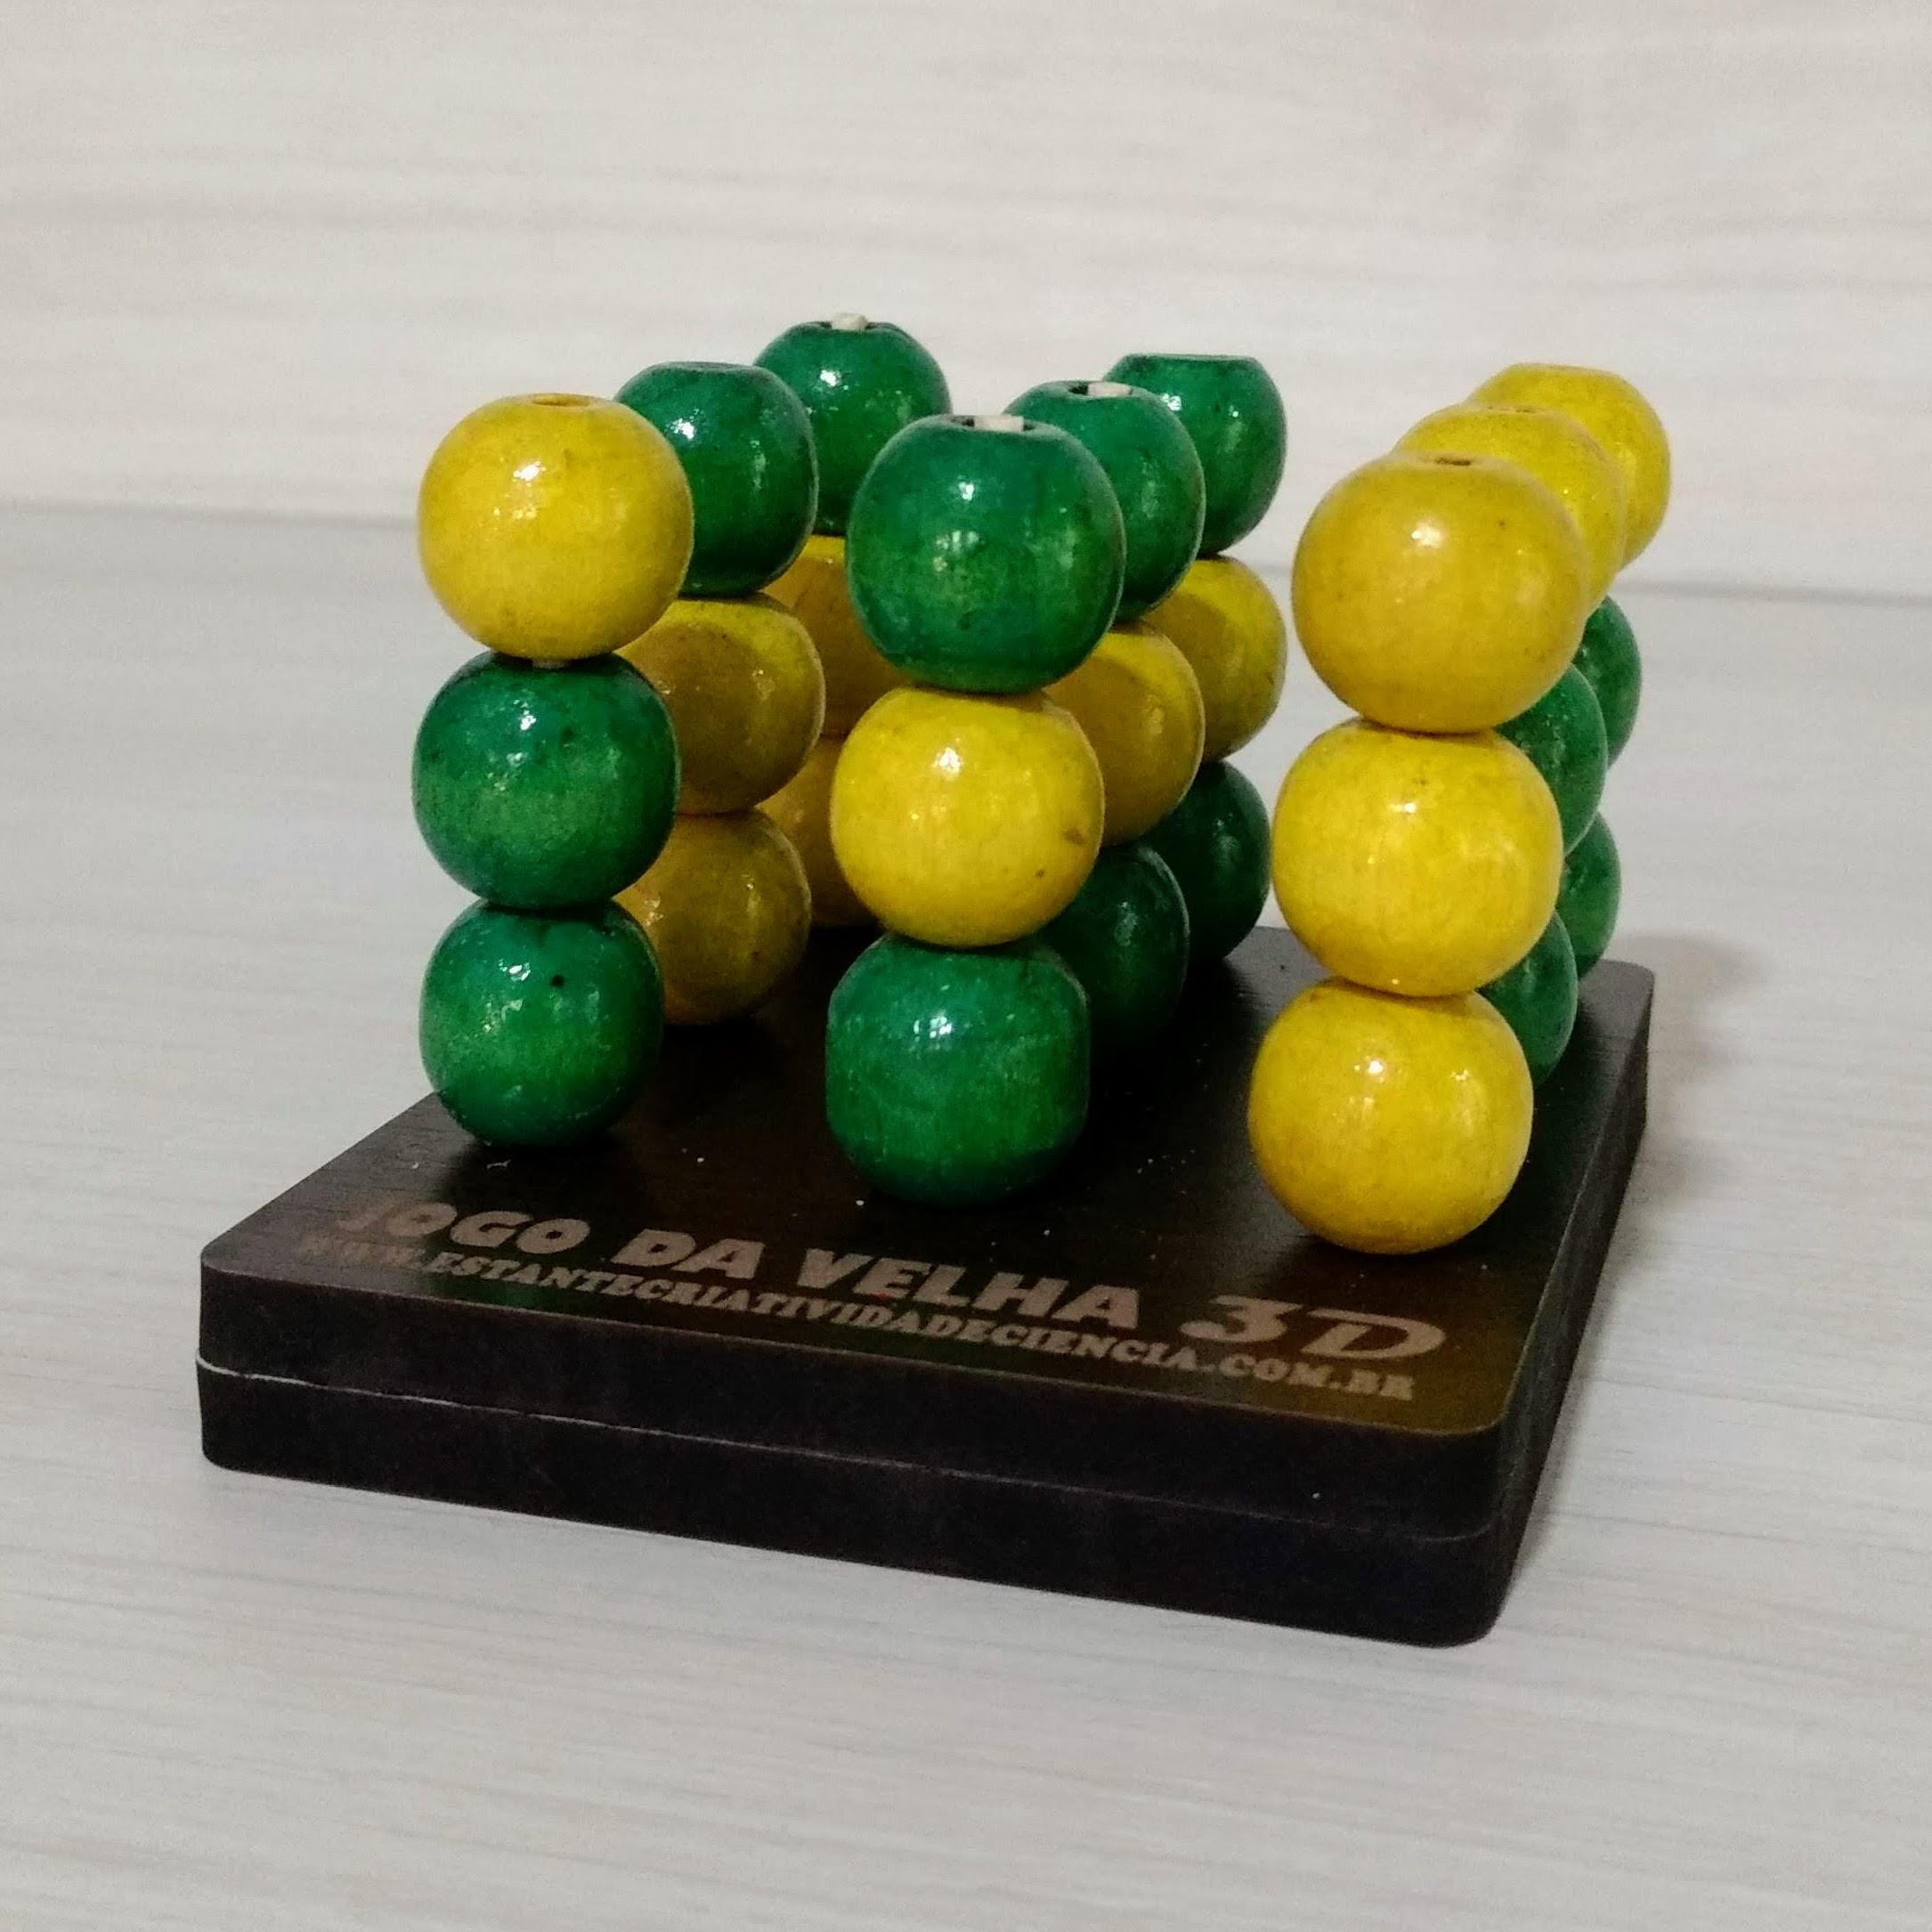 Jogo da Velha 3D